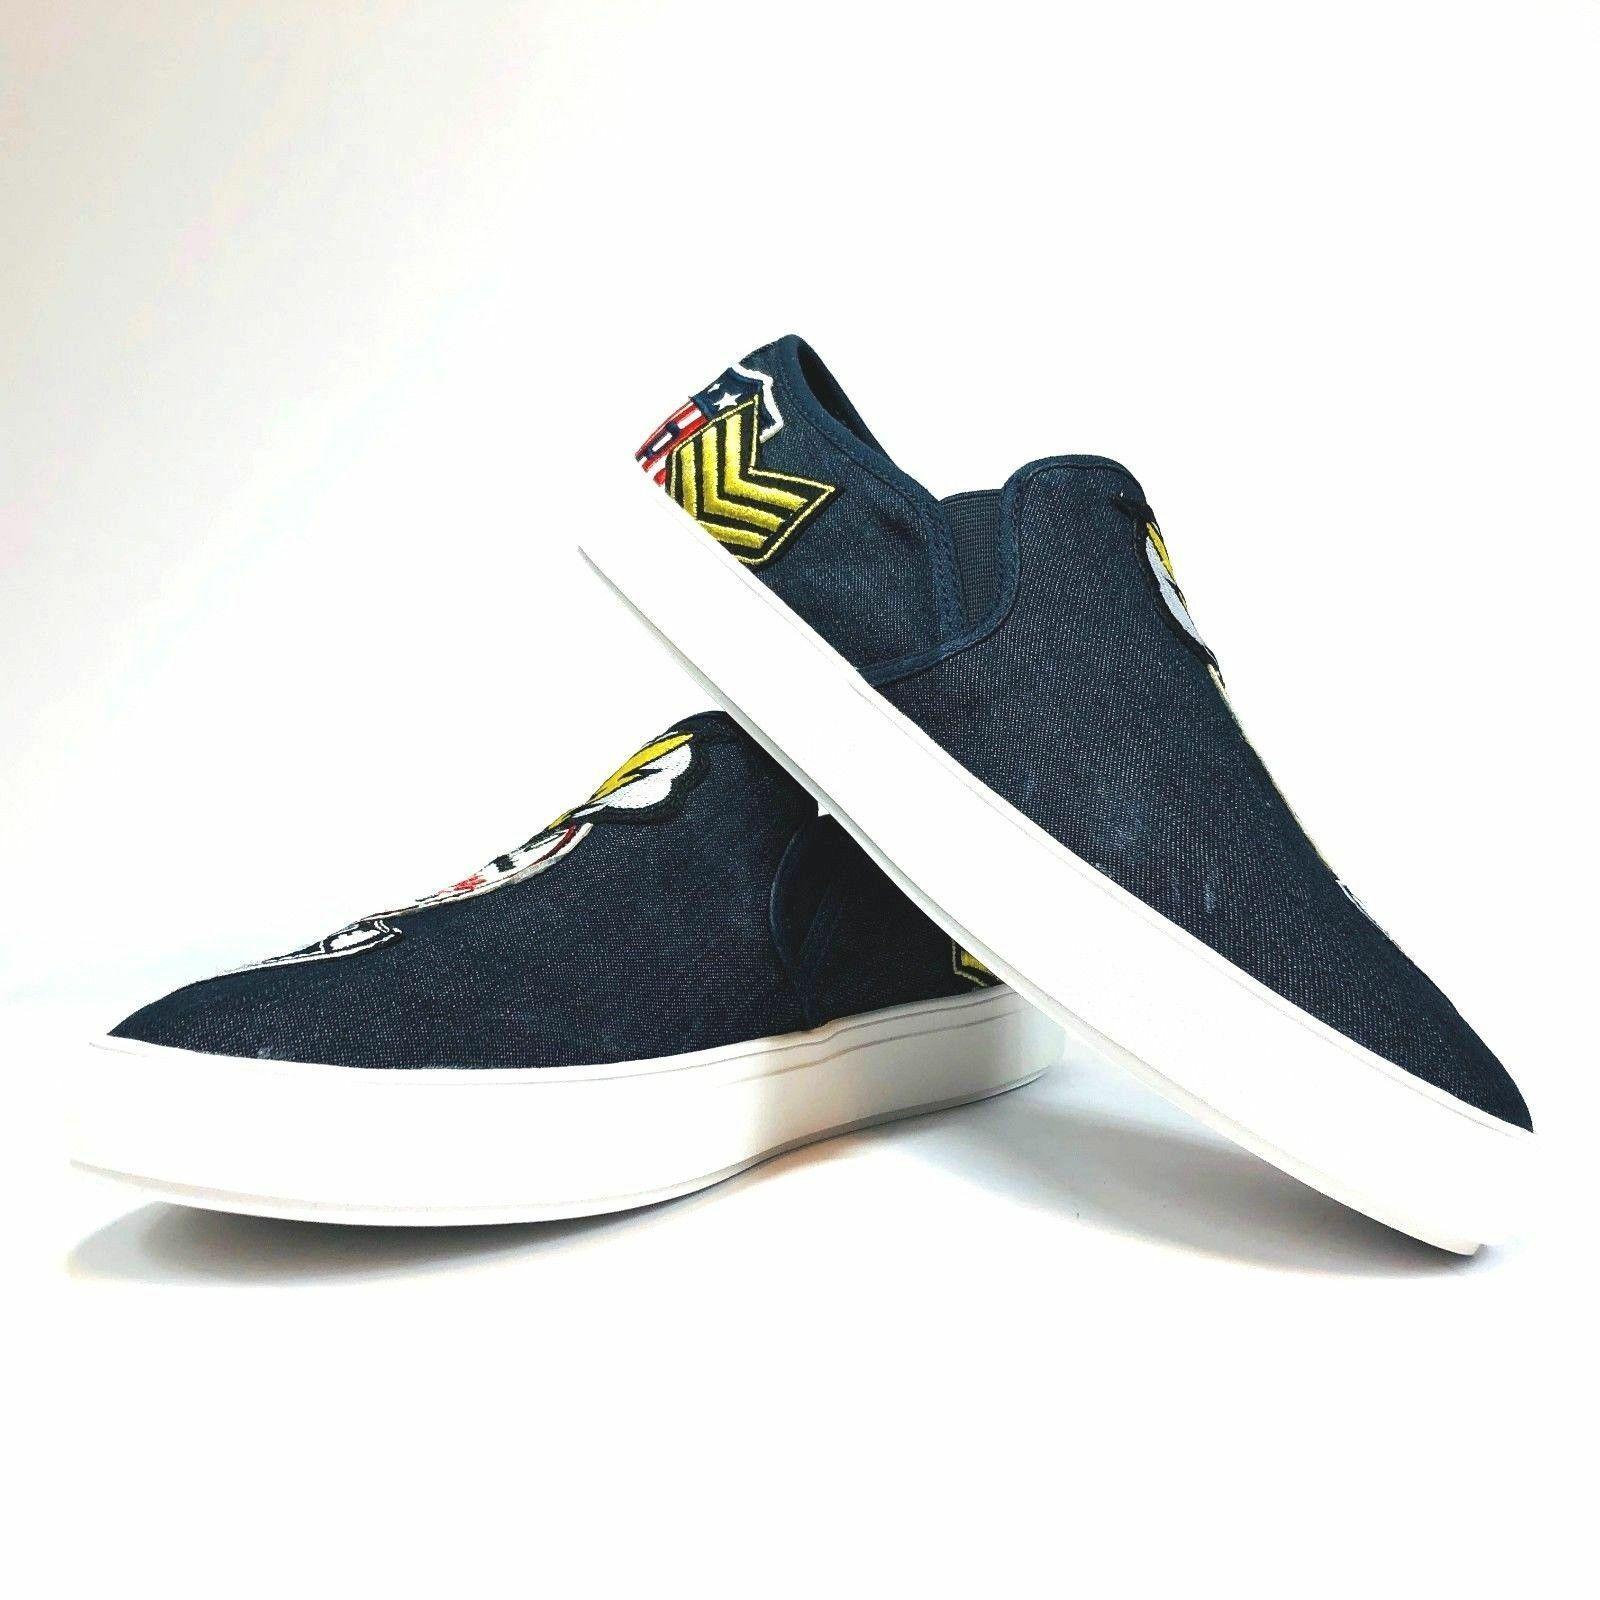 Steve Madden Wasdin Navy Blue or Military Denim Slip On Loafers Mens Vintage image 14